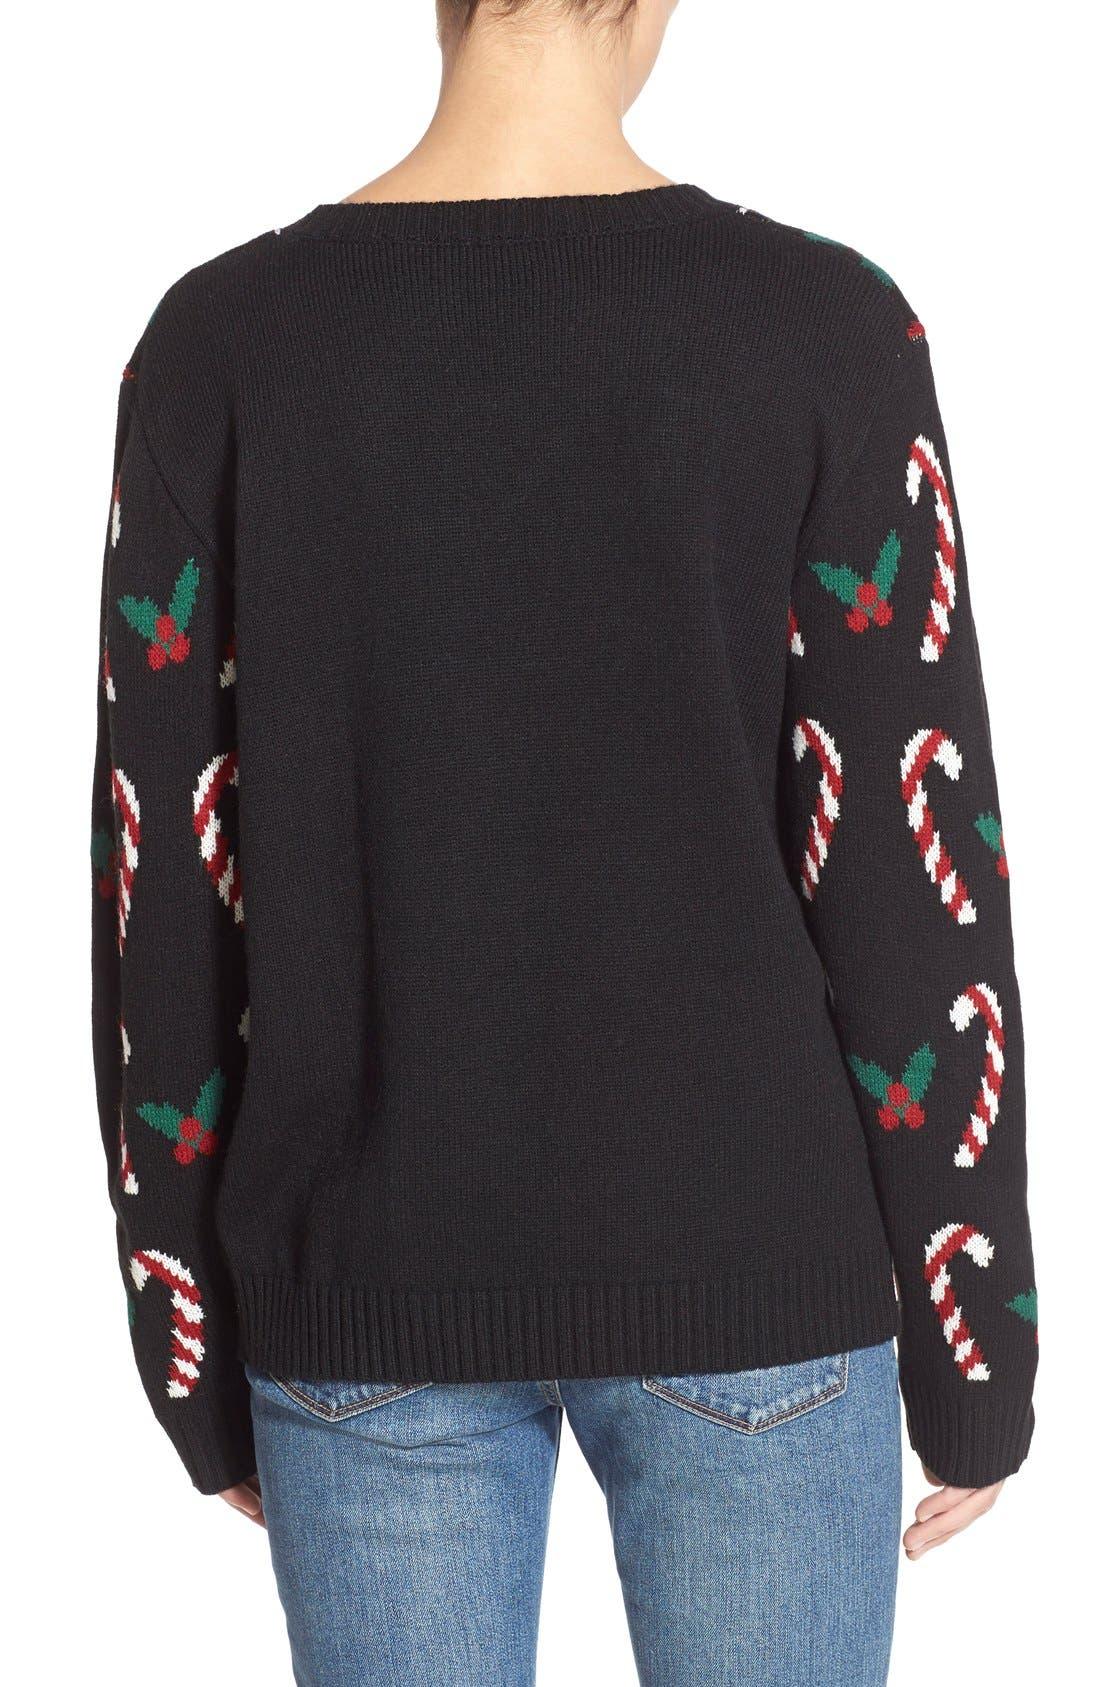 LOVE BY DESIGN, Mistletoe Reindeer Christmas Sweater, Alternate thumbnail 4, color, 016